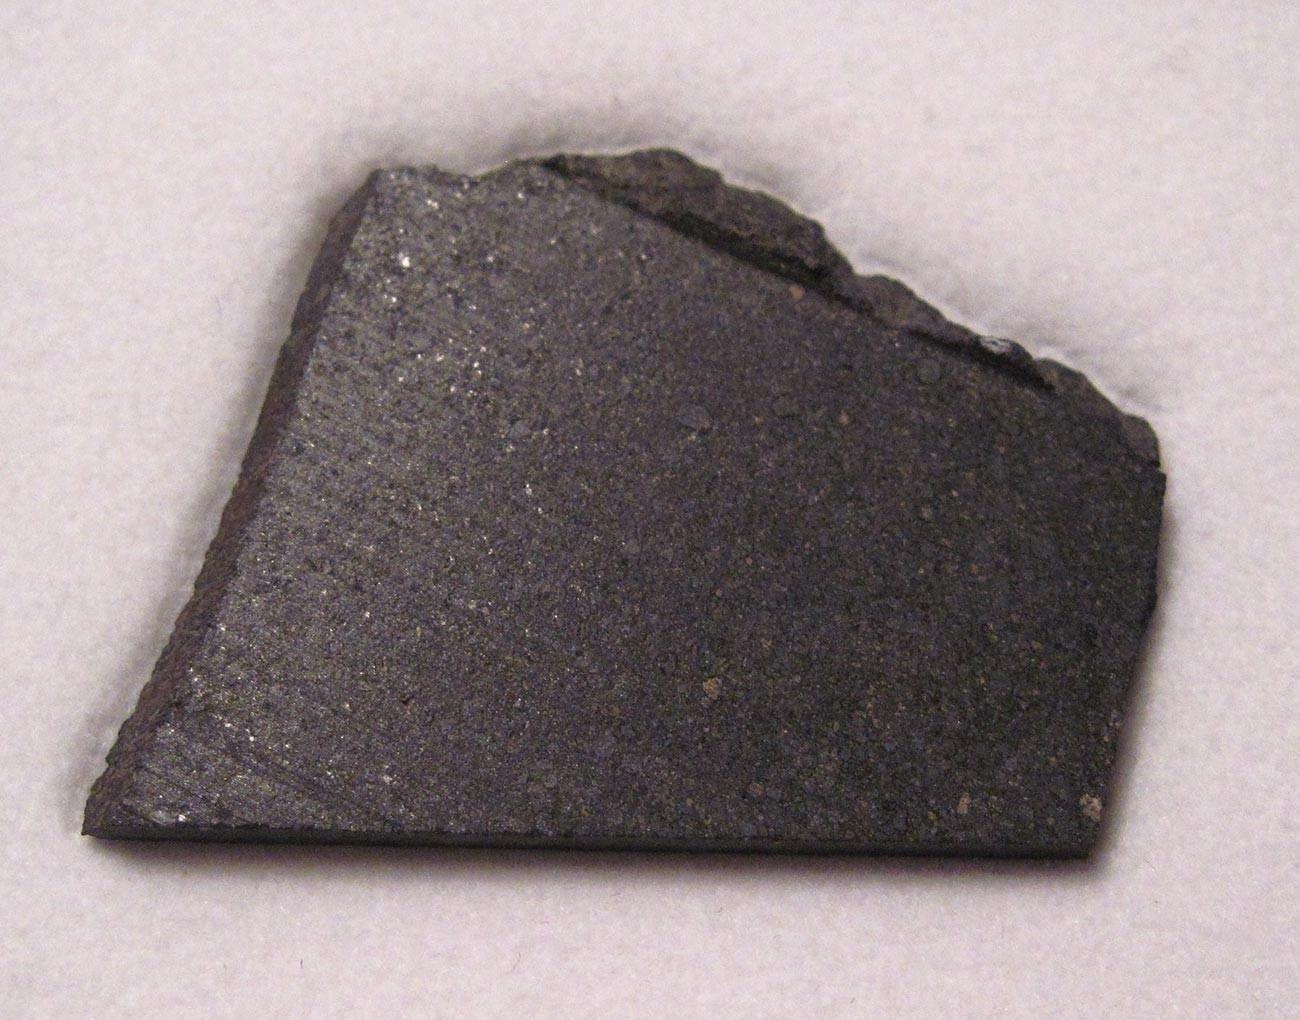 Un fragment de 4,04 grammes